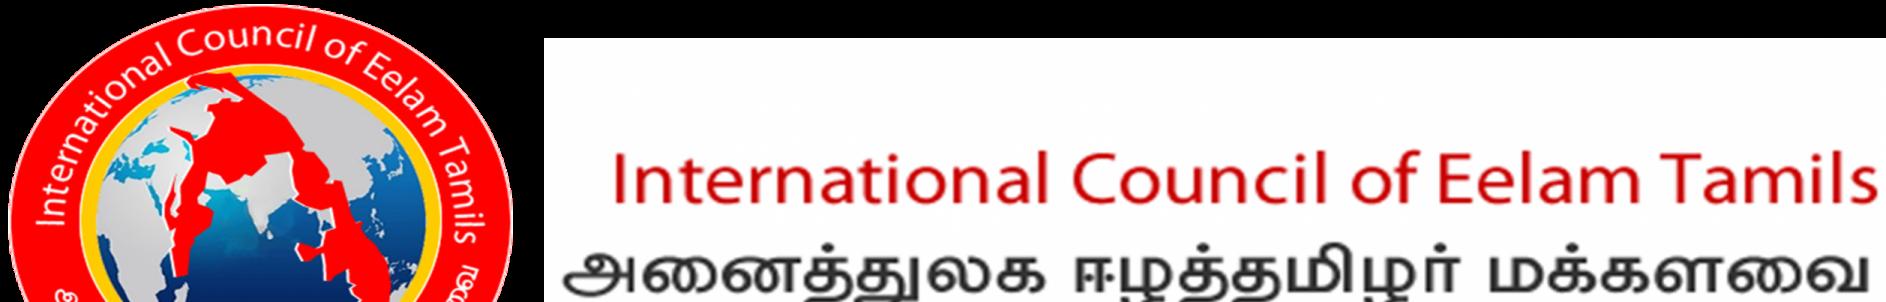 International Council of Eelam Tamils